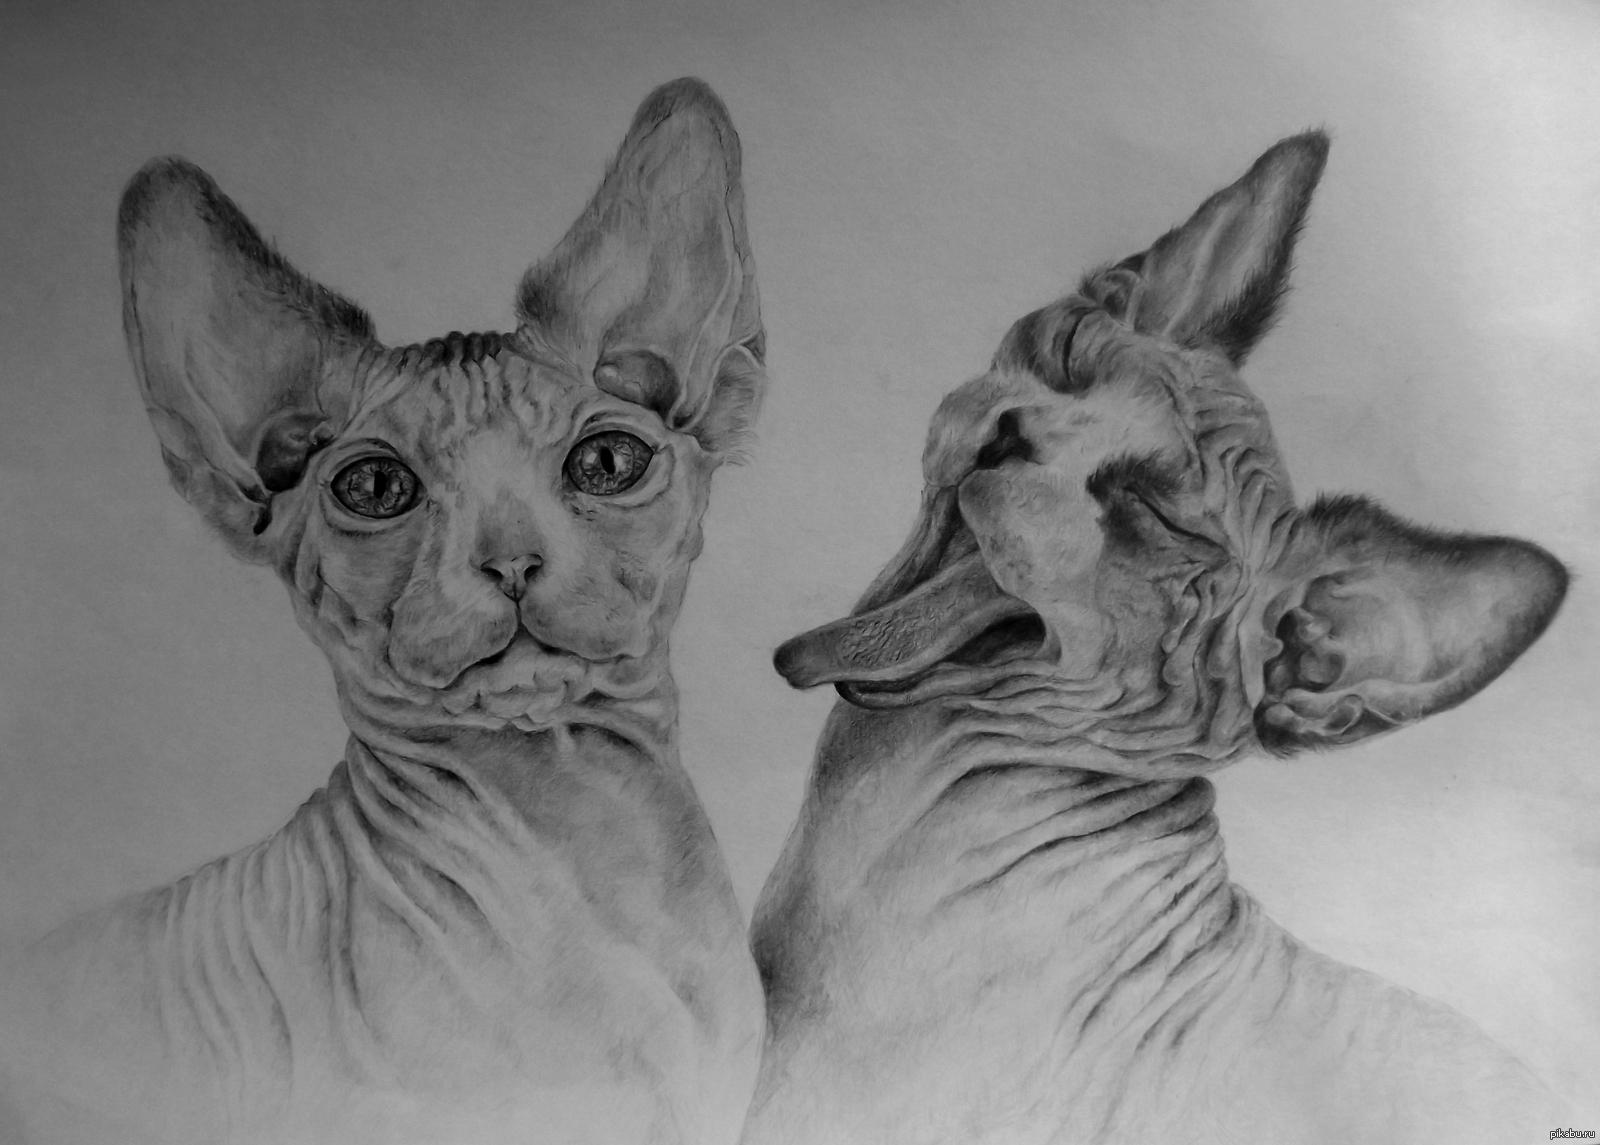 найти рисунки карандашом кошек фото того дома сборно